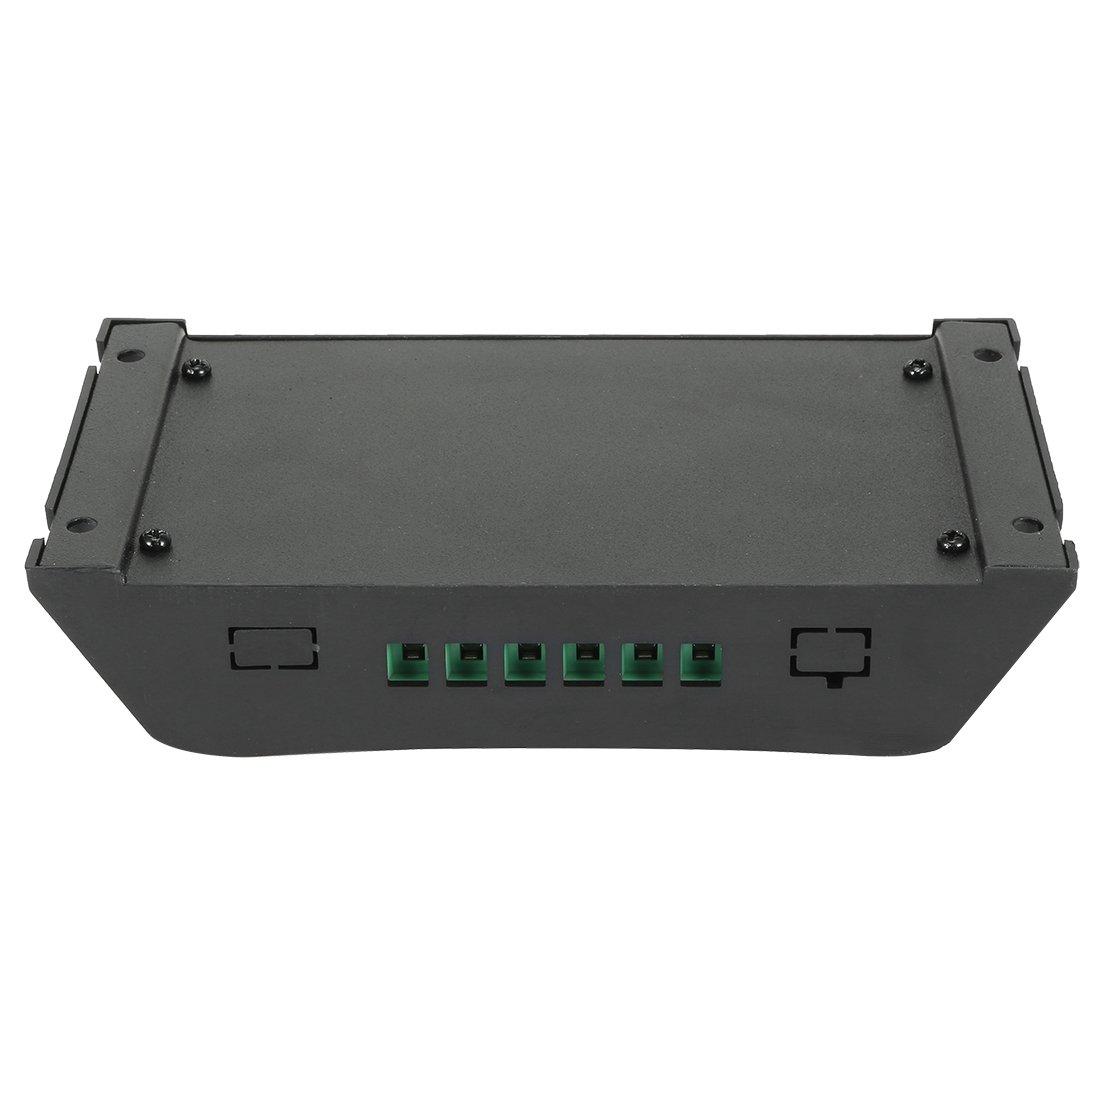 uxcell Intelligent 10A Solar Panel Charge Controller 12V-24V Battery Regulator PV2410 a17031000ux0294